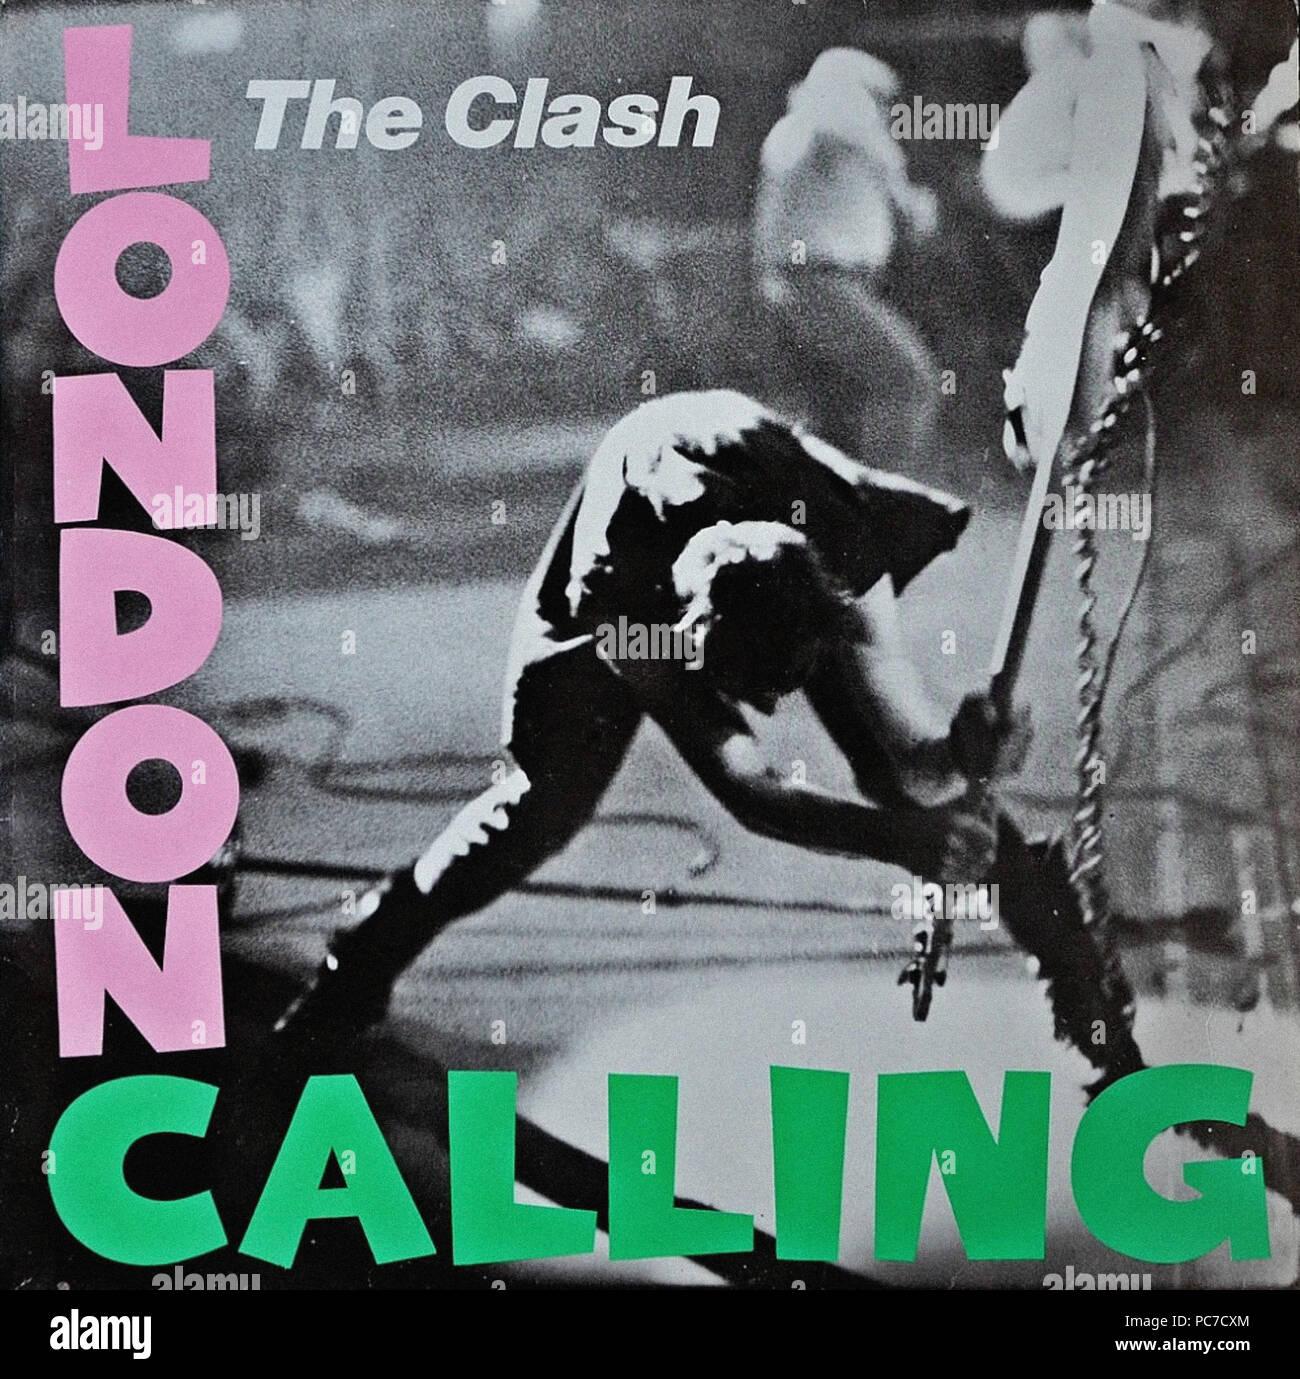 The Clash - London Calling - Vintage vinyl album cover Stock Photo ...